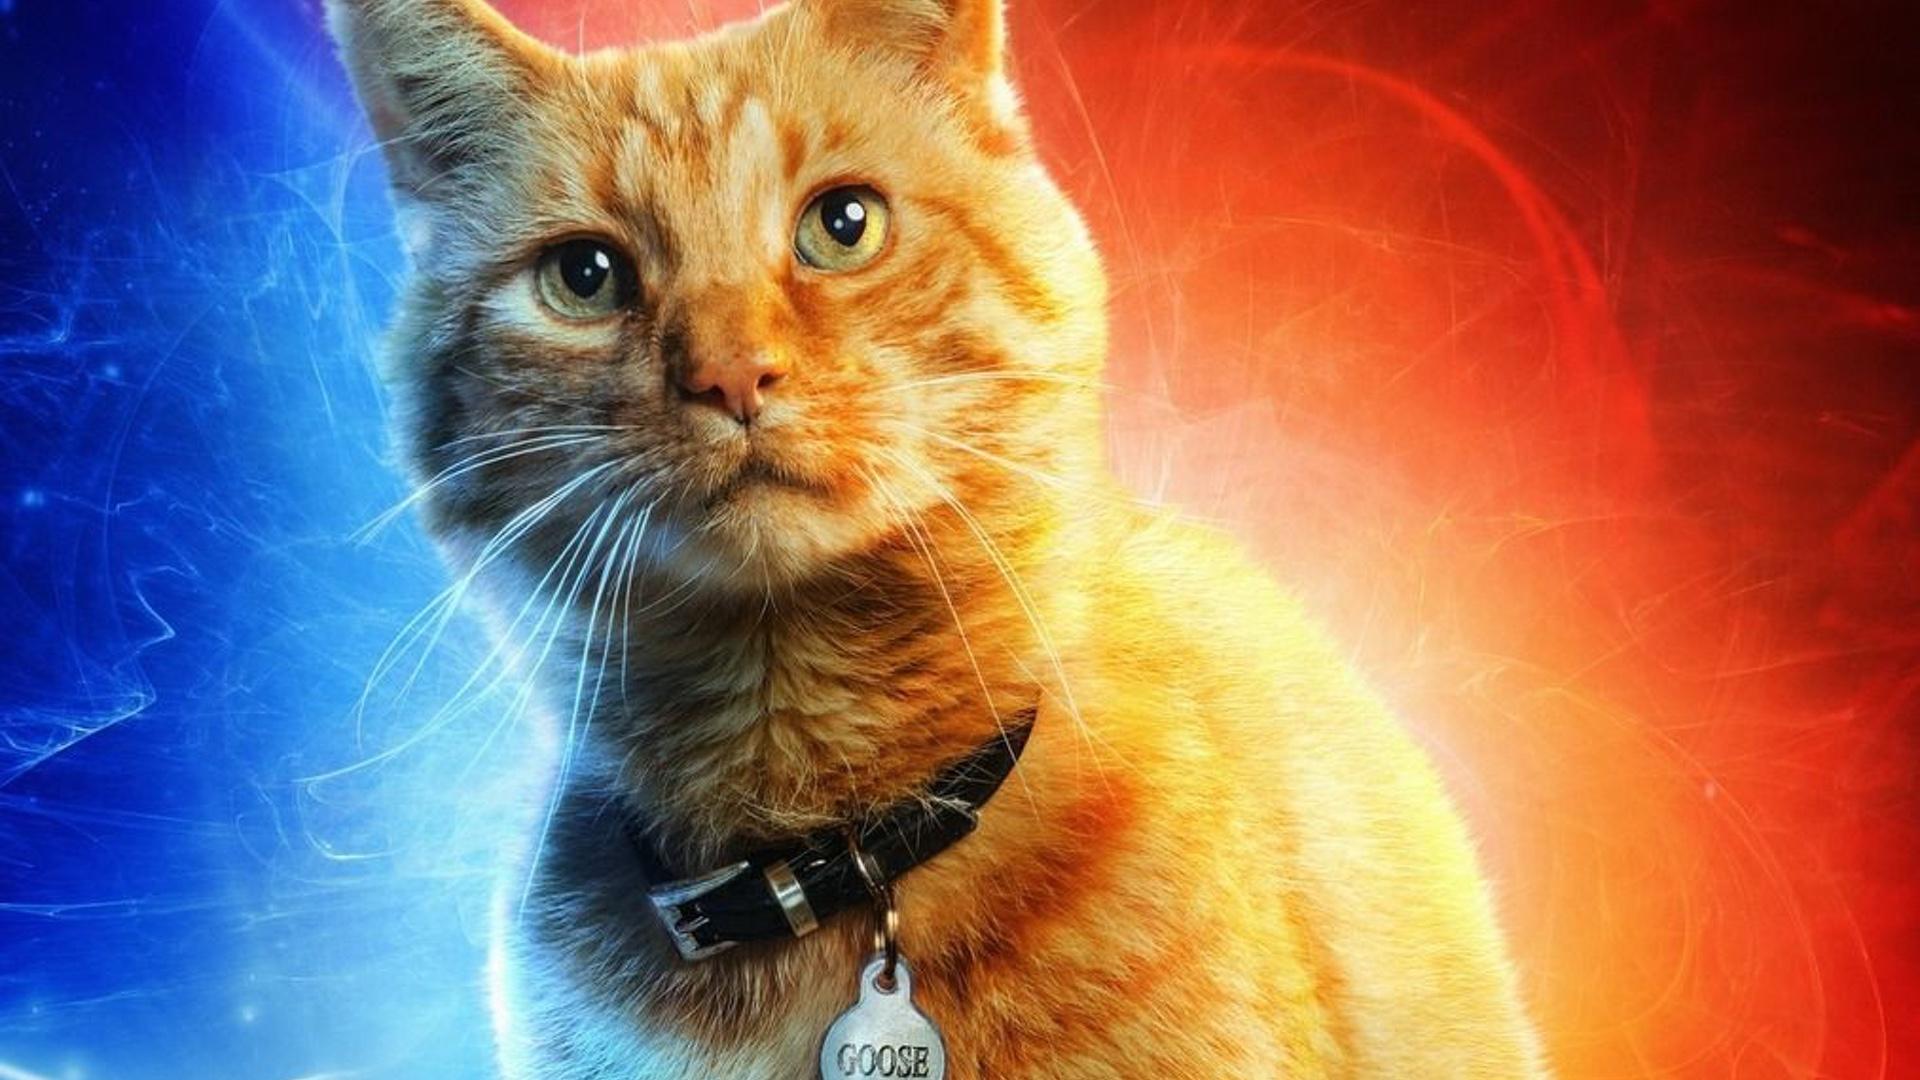 new-captain-marvel-tv-spot-highlights-a-funny-scene-involving-goose-the-cat-social.jpg